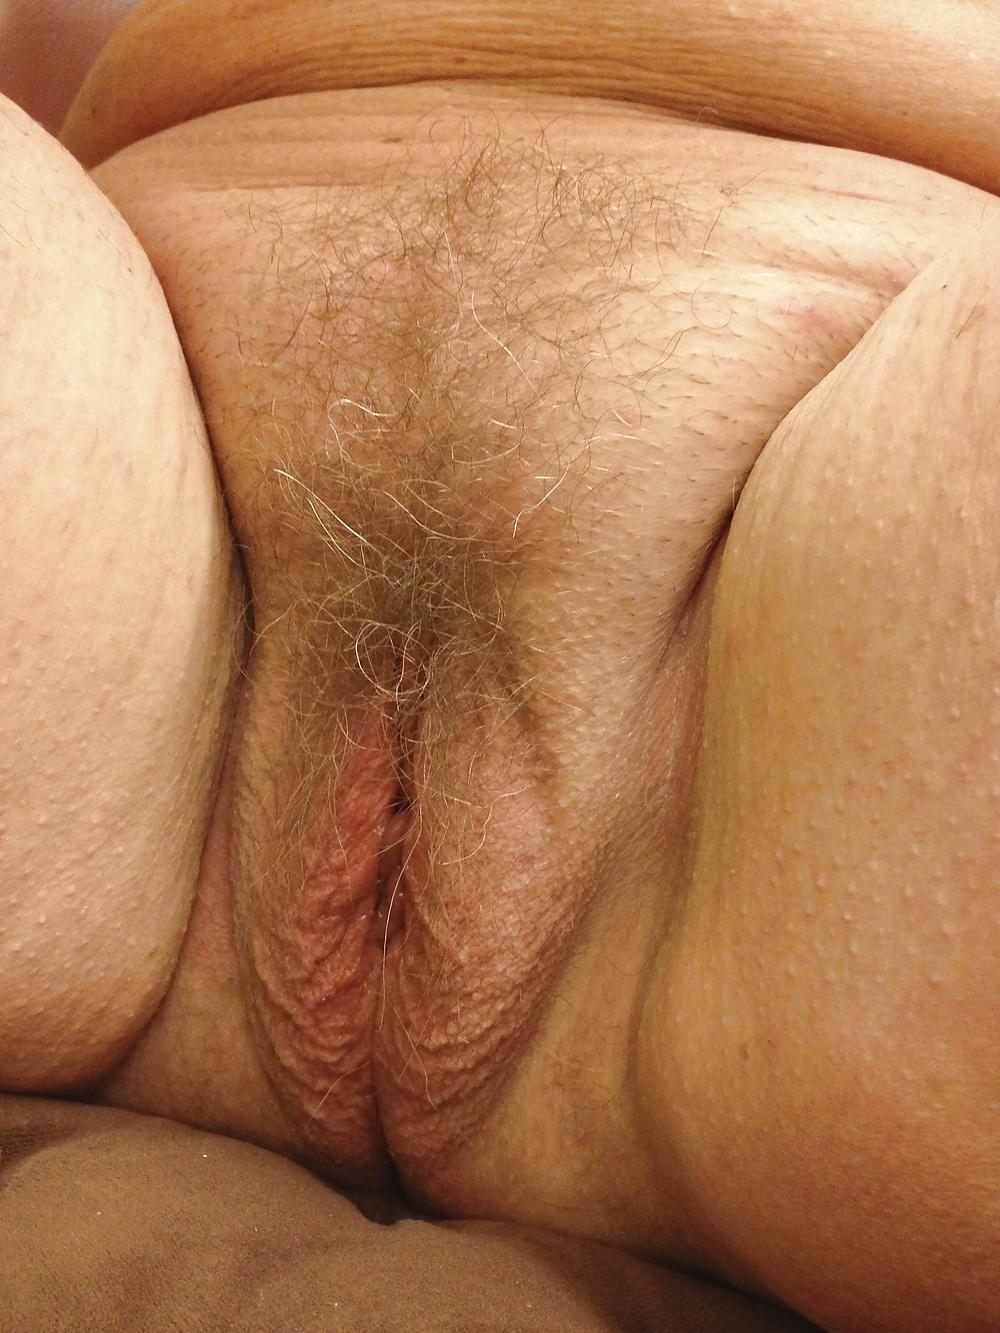 Mature vulva pictures, barbara barbie blank pussy